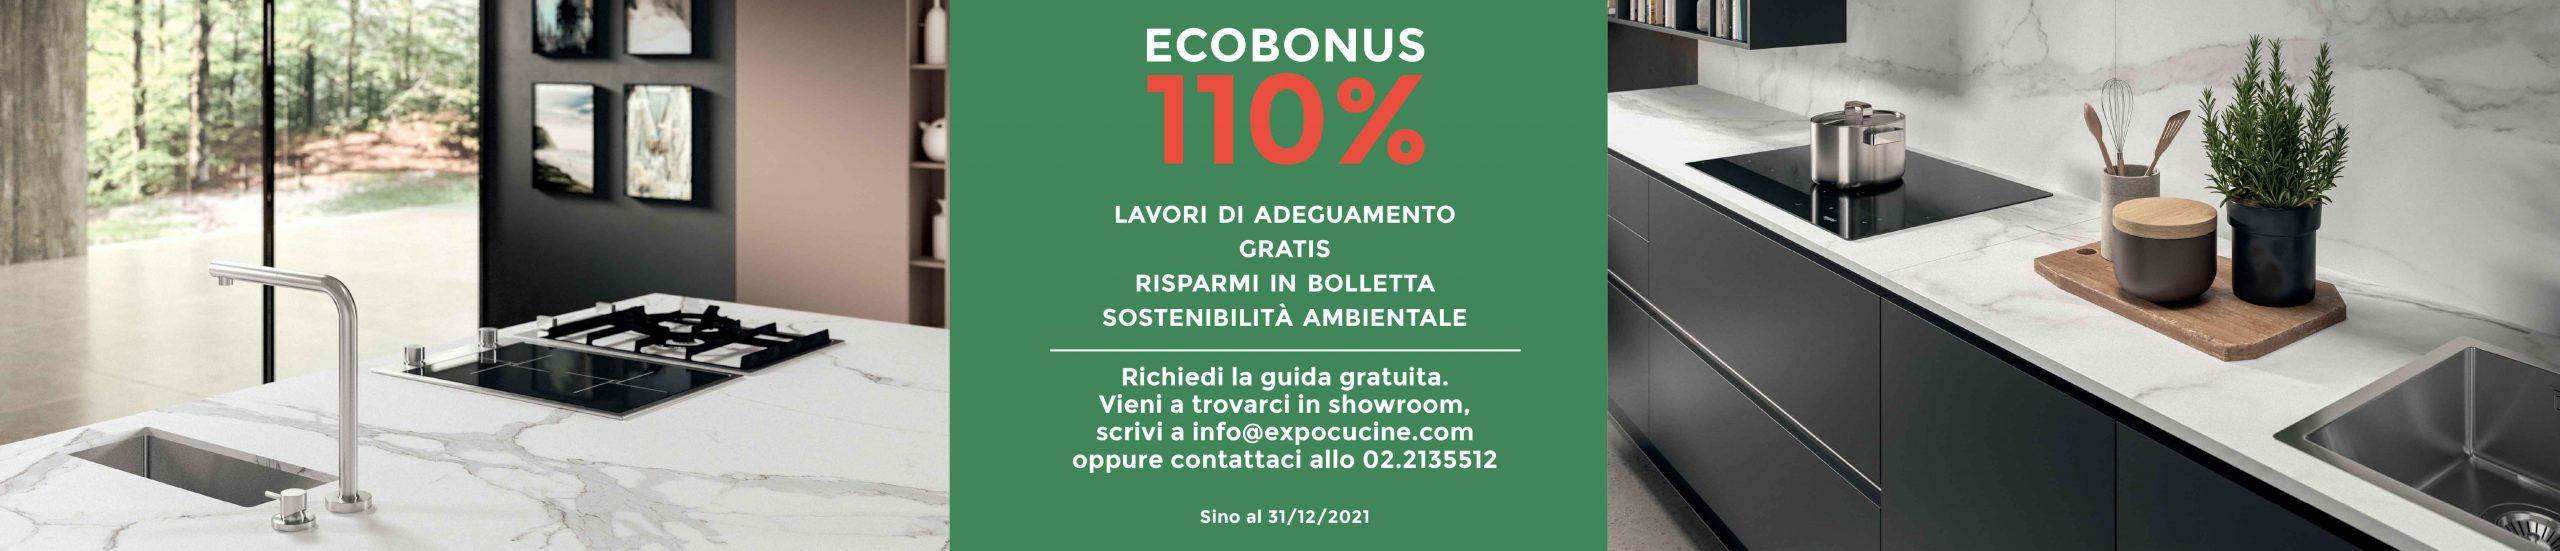 banner-ecobonus-set2020-1860X400